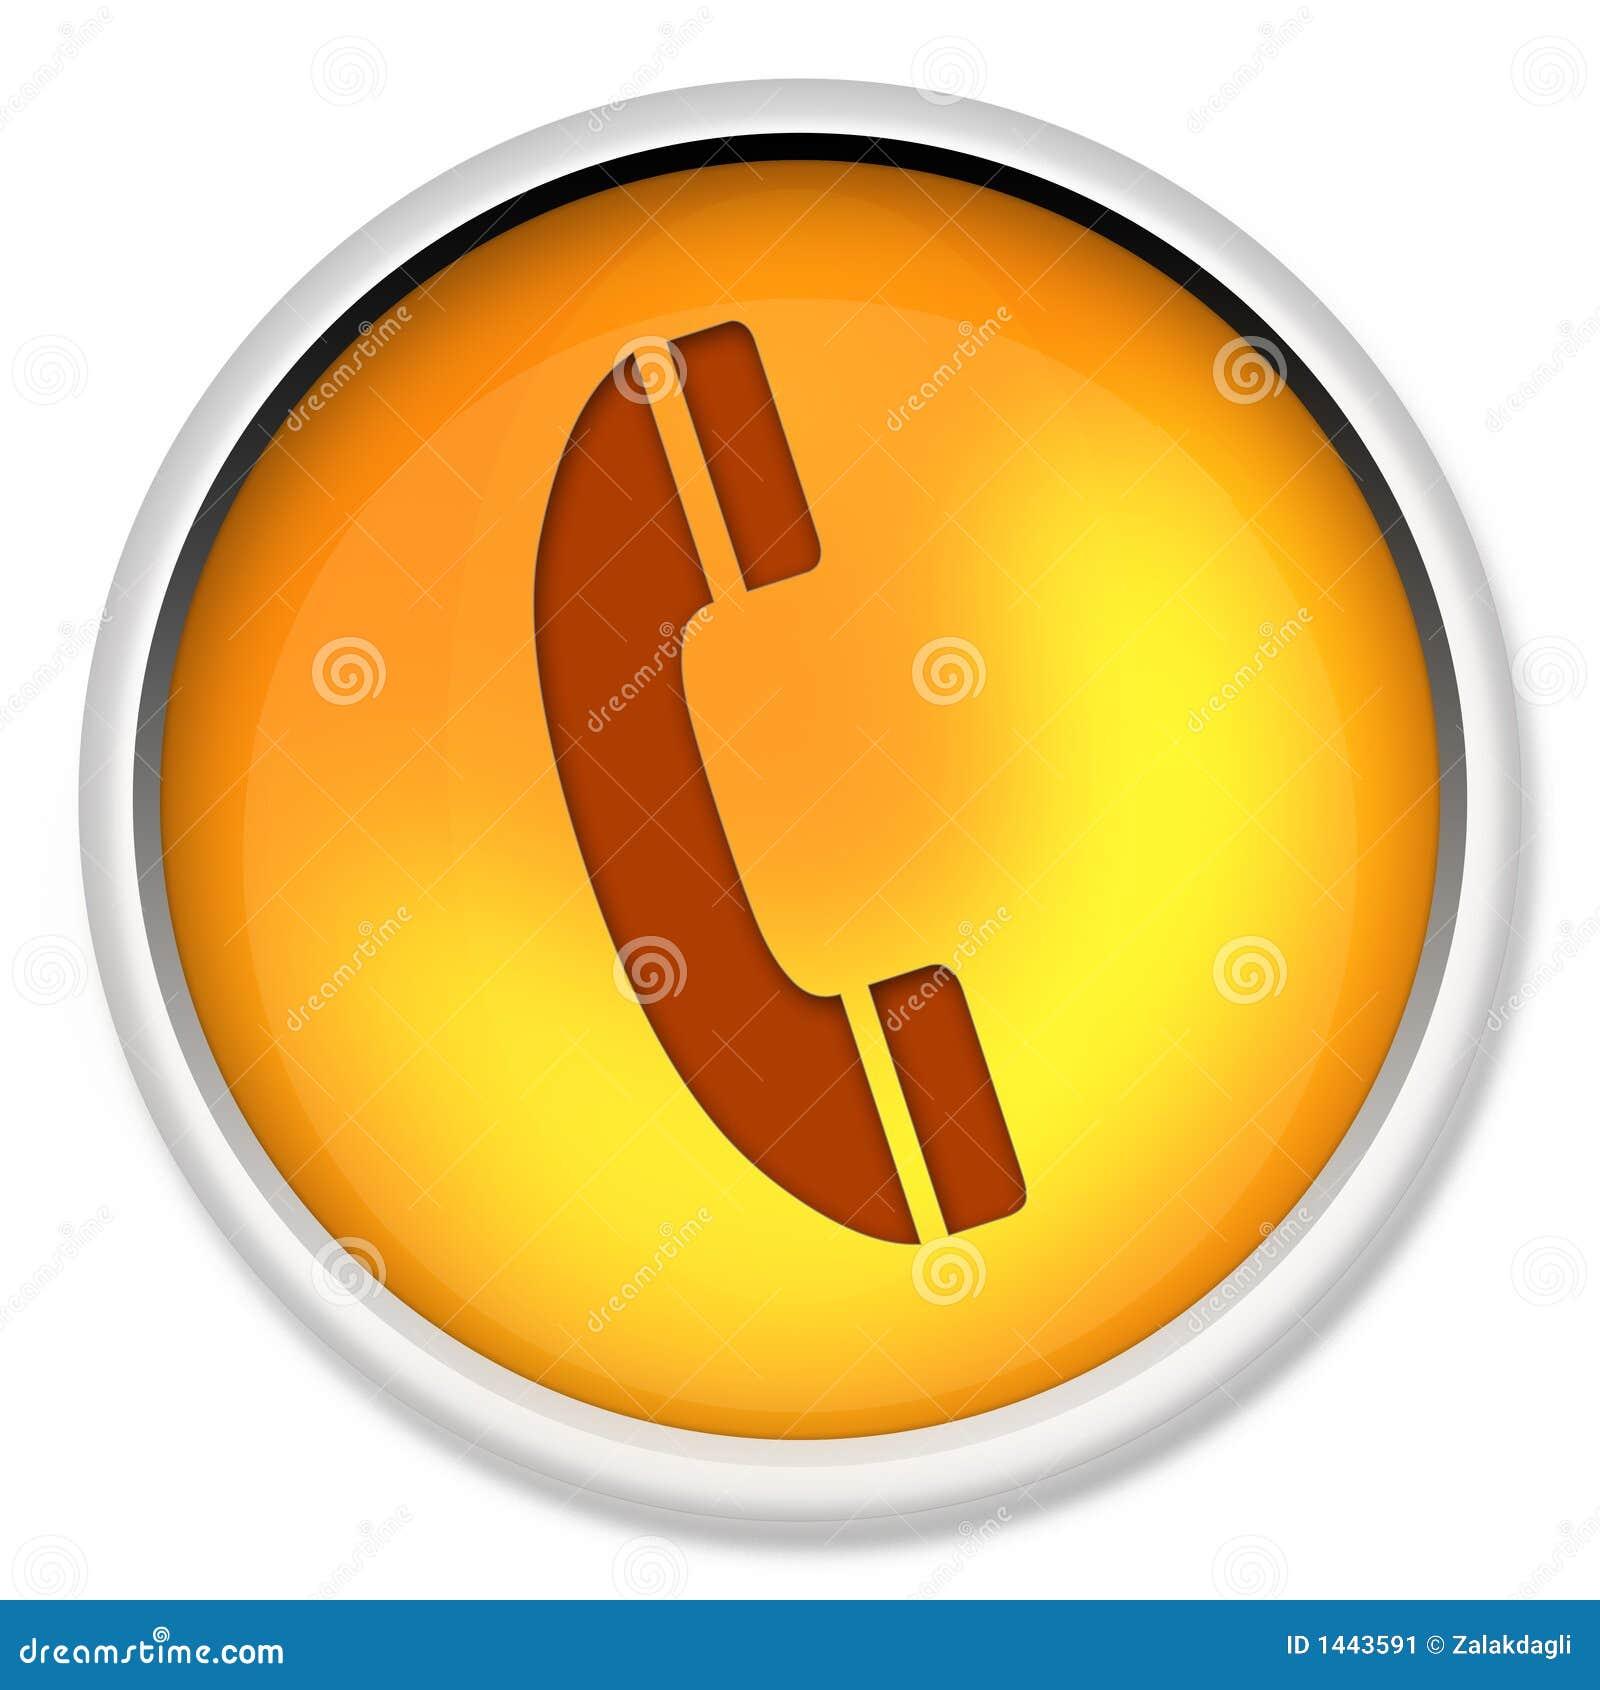 Pictogram, telefoon, telefoon, elektronische kabel, apparatuur, bureau, knoop, telecommunicatie